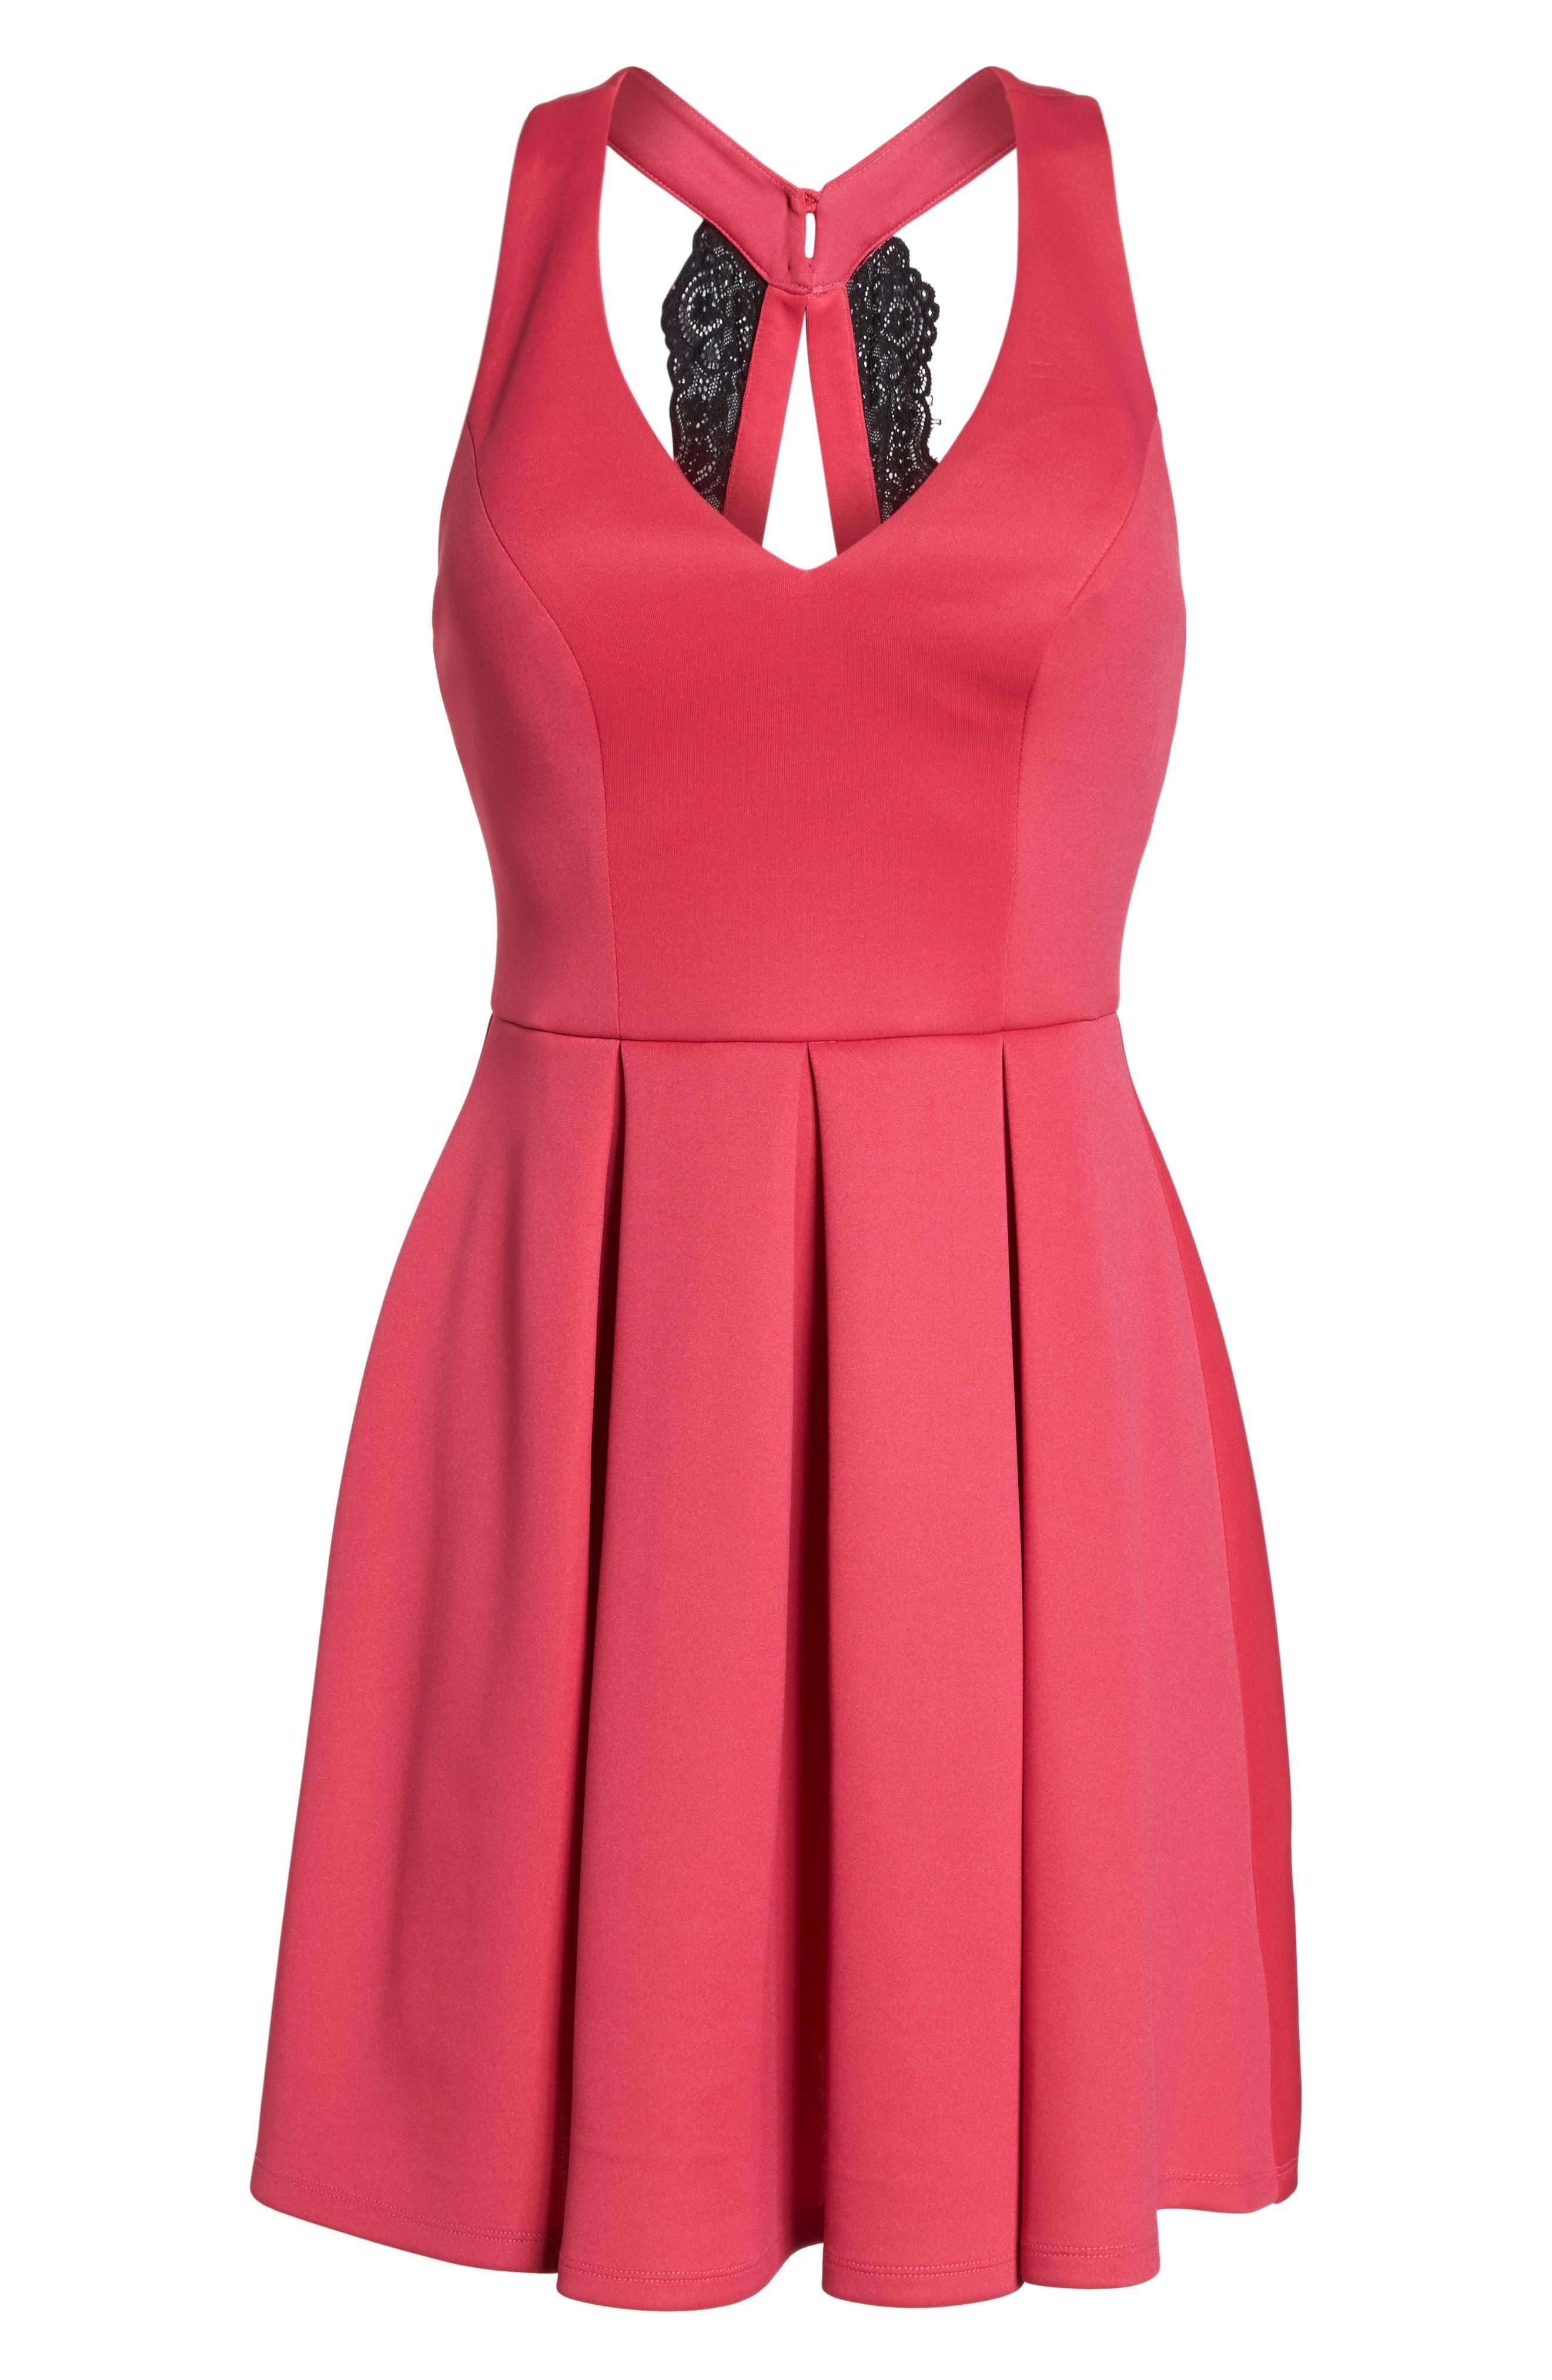 Lace Back Scuba Dress,                             Alternate thumbnail 6, color,                             Hot Pink/ Black